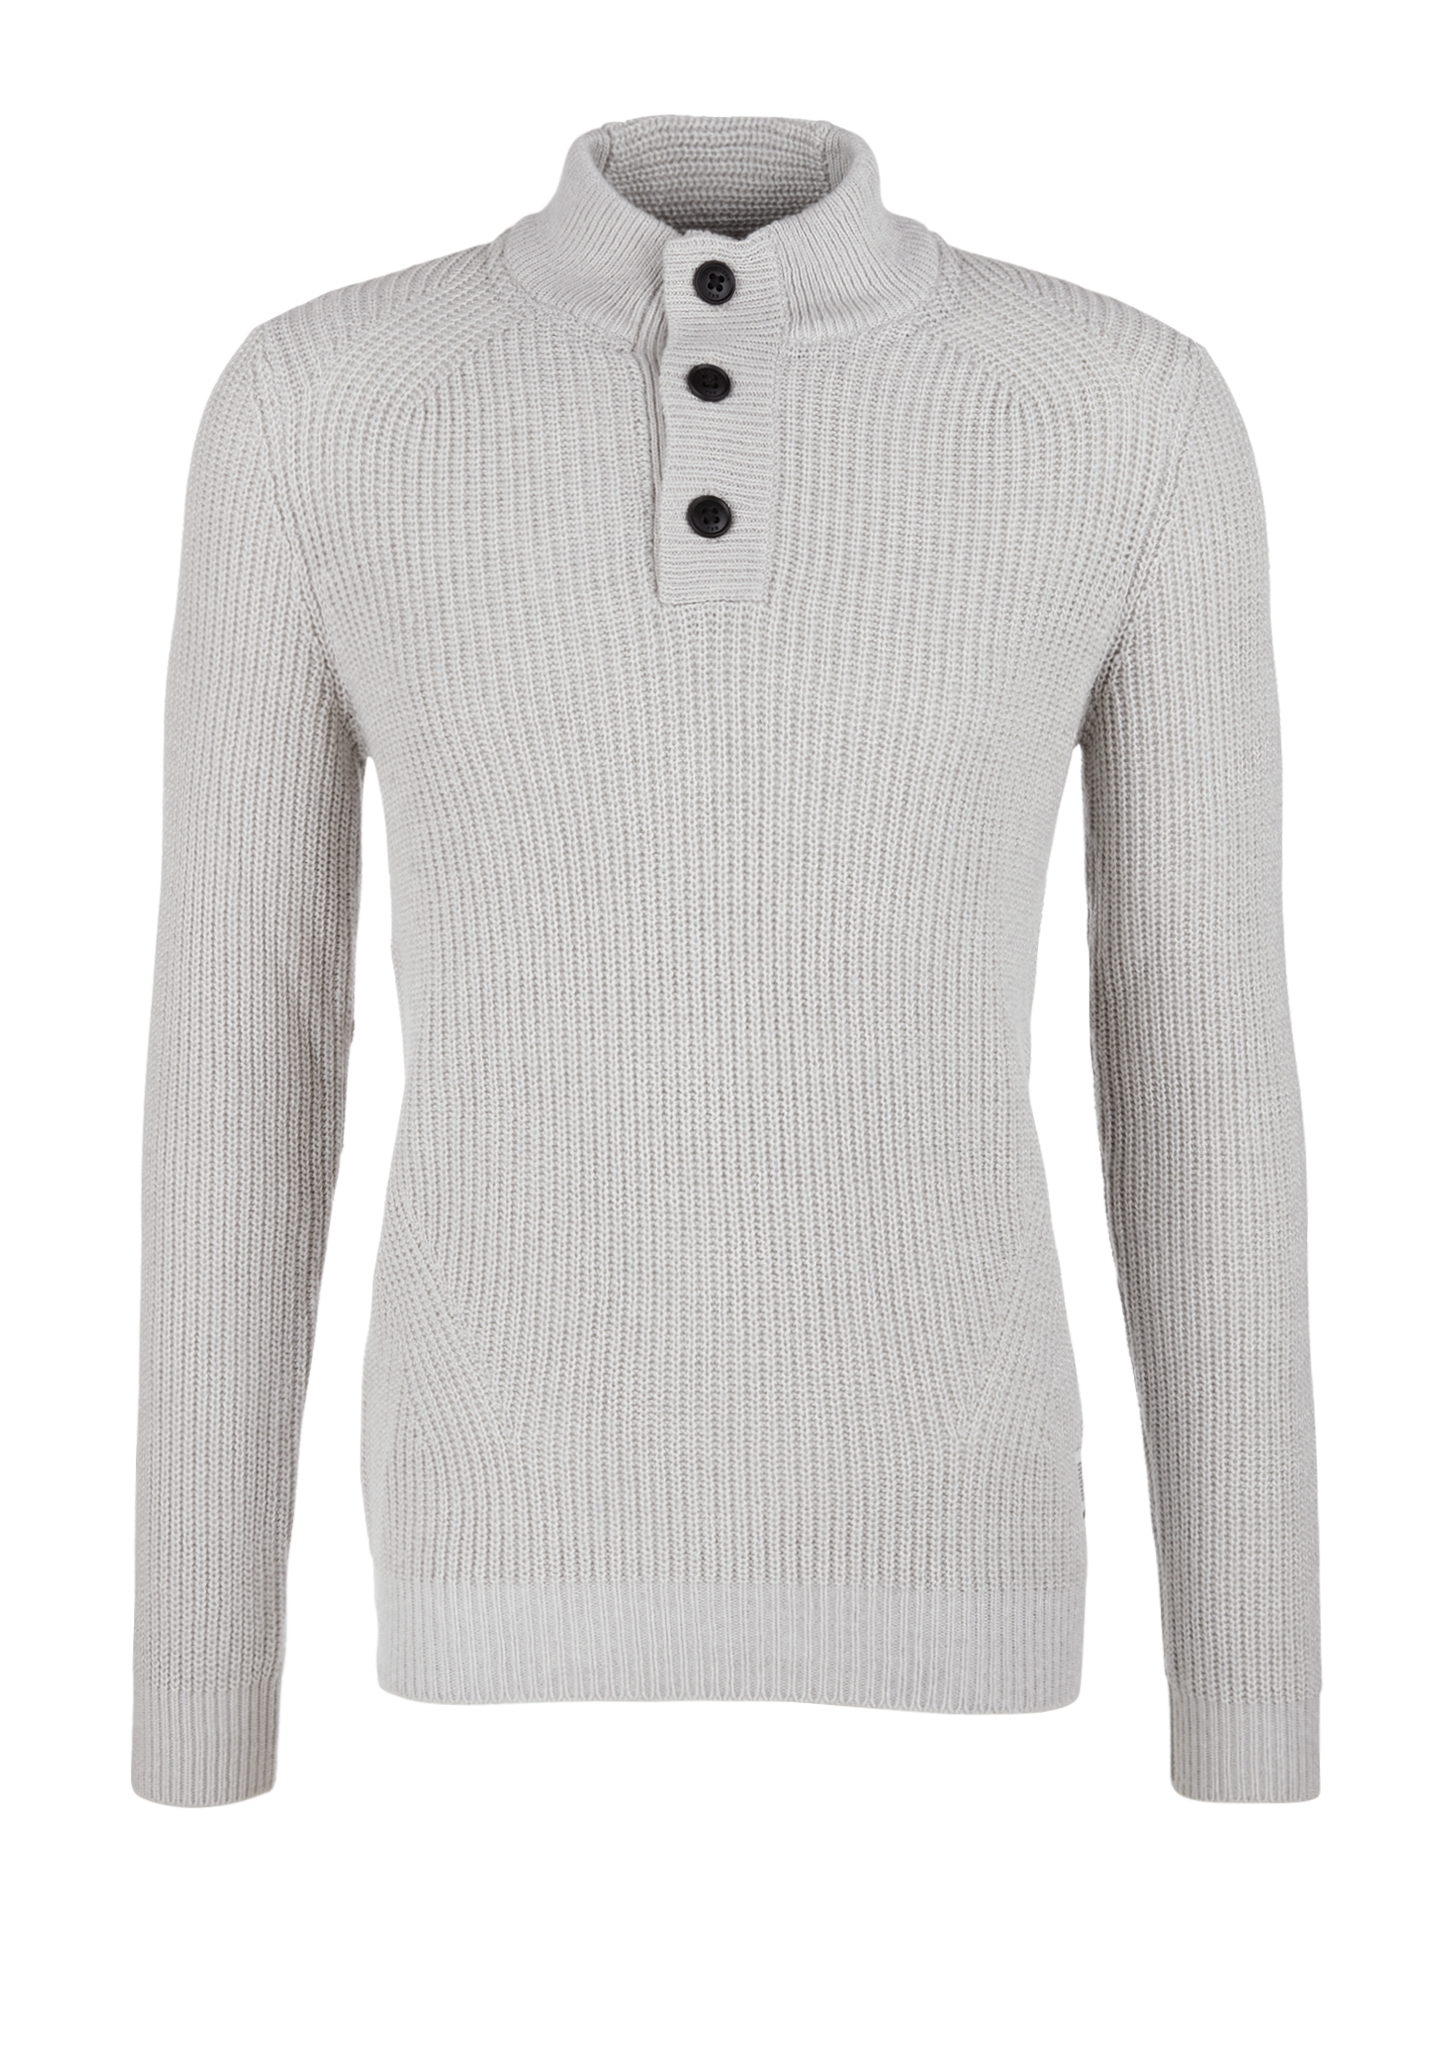 Troyer   Bekleidung > Pullover > Troyer   Weiß   52% baumwolle -  48% polyacryl   s.Oliver